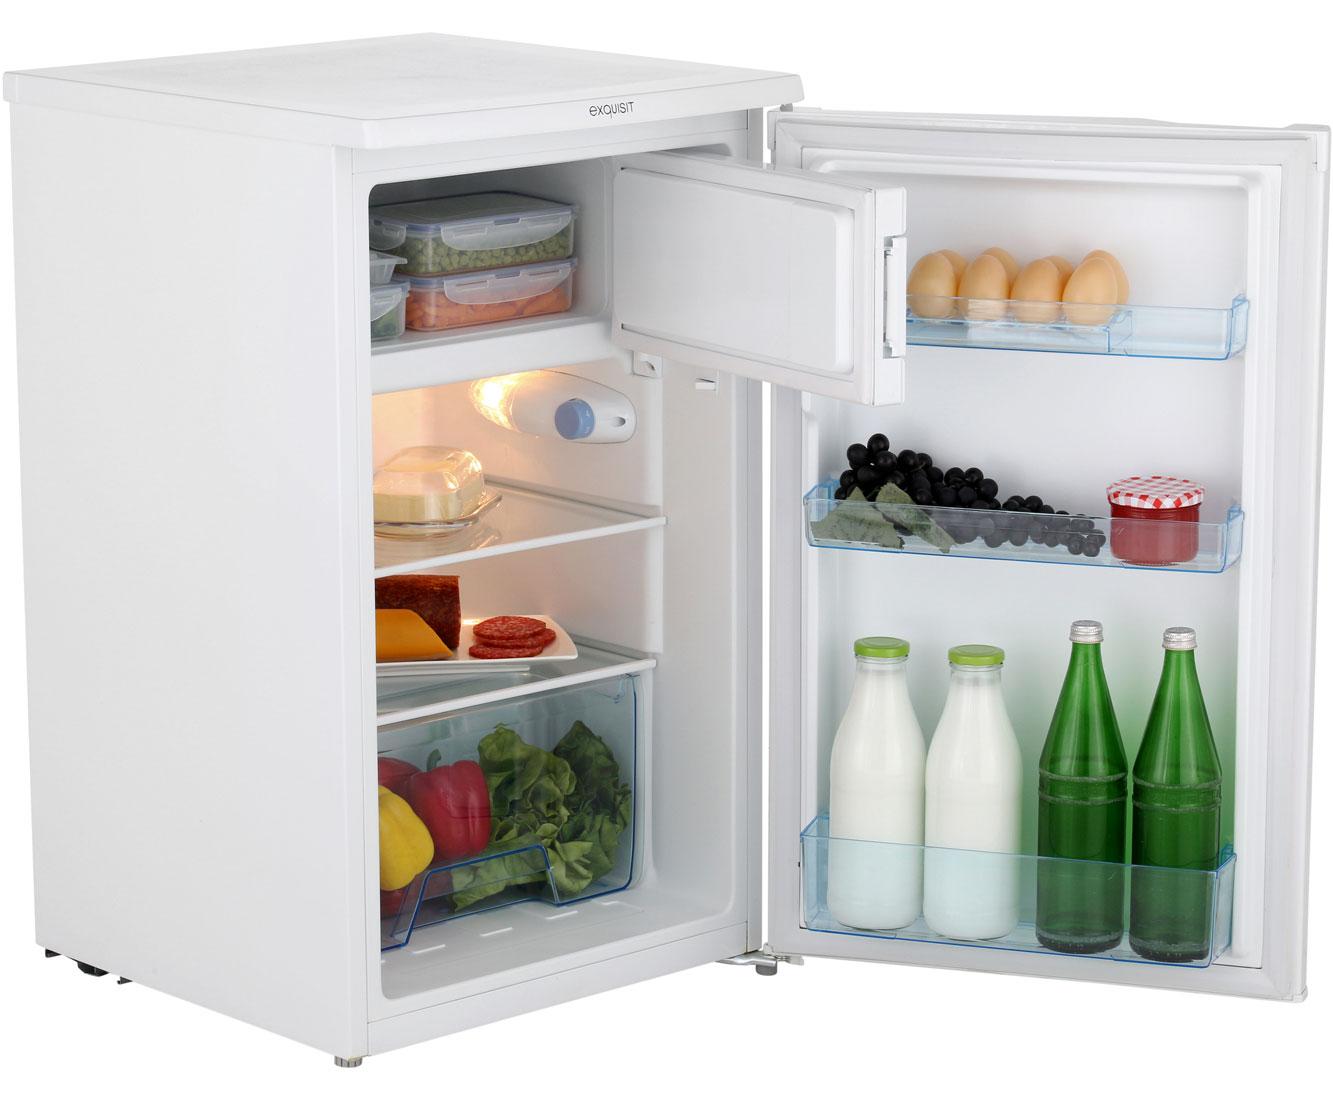 Mini Kühlschrank Billig : Single kühlschrank mit gefrierfach mini einbaukühlschrank